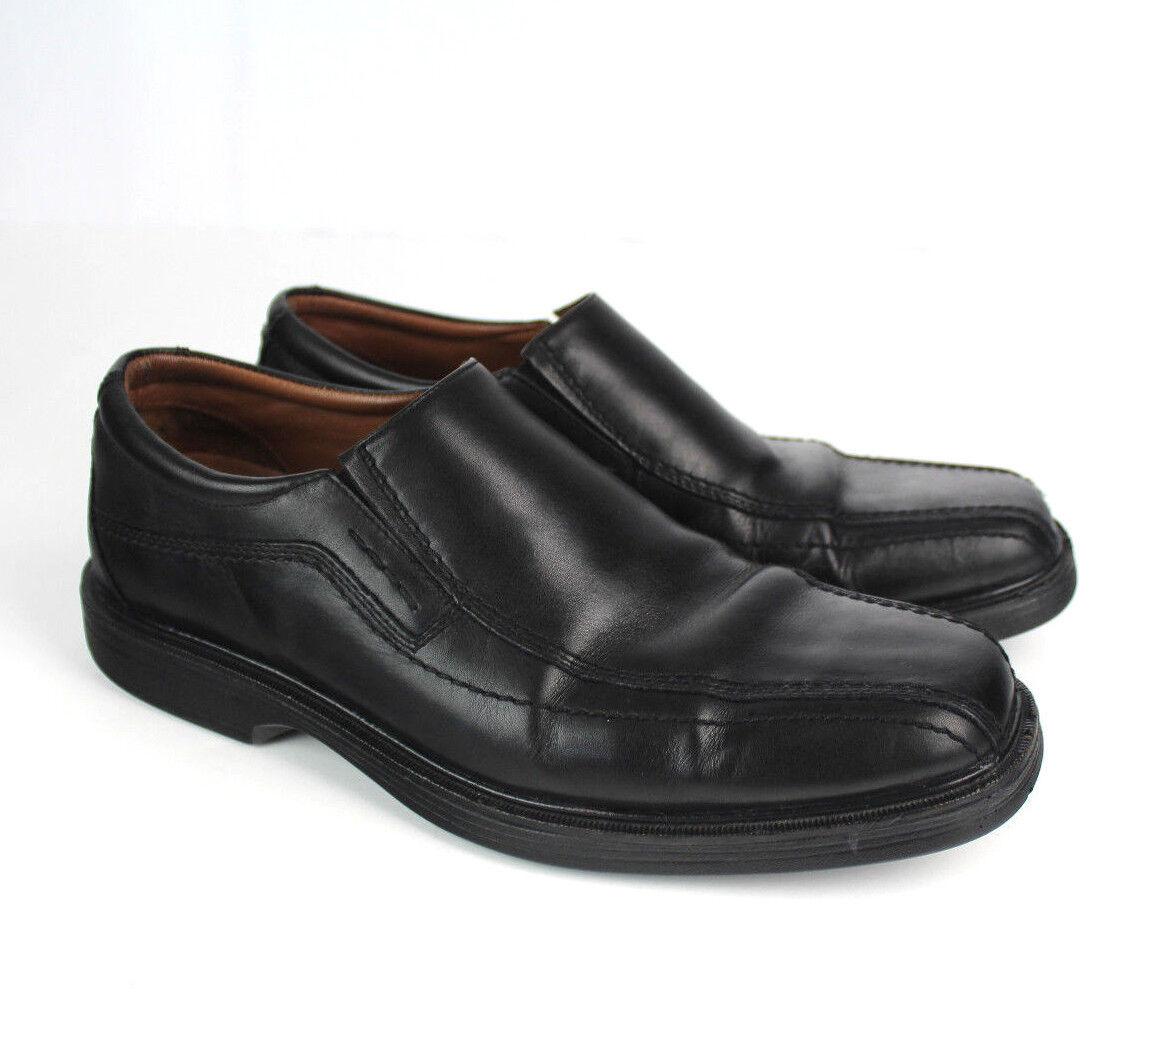 144 Johnston & Murphy Dress Shoes Size 9 Uomo Loafer XC4 Sheepskin Slip-On